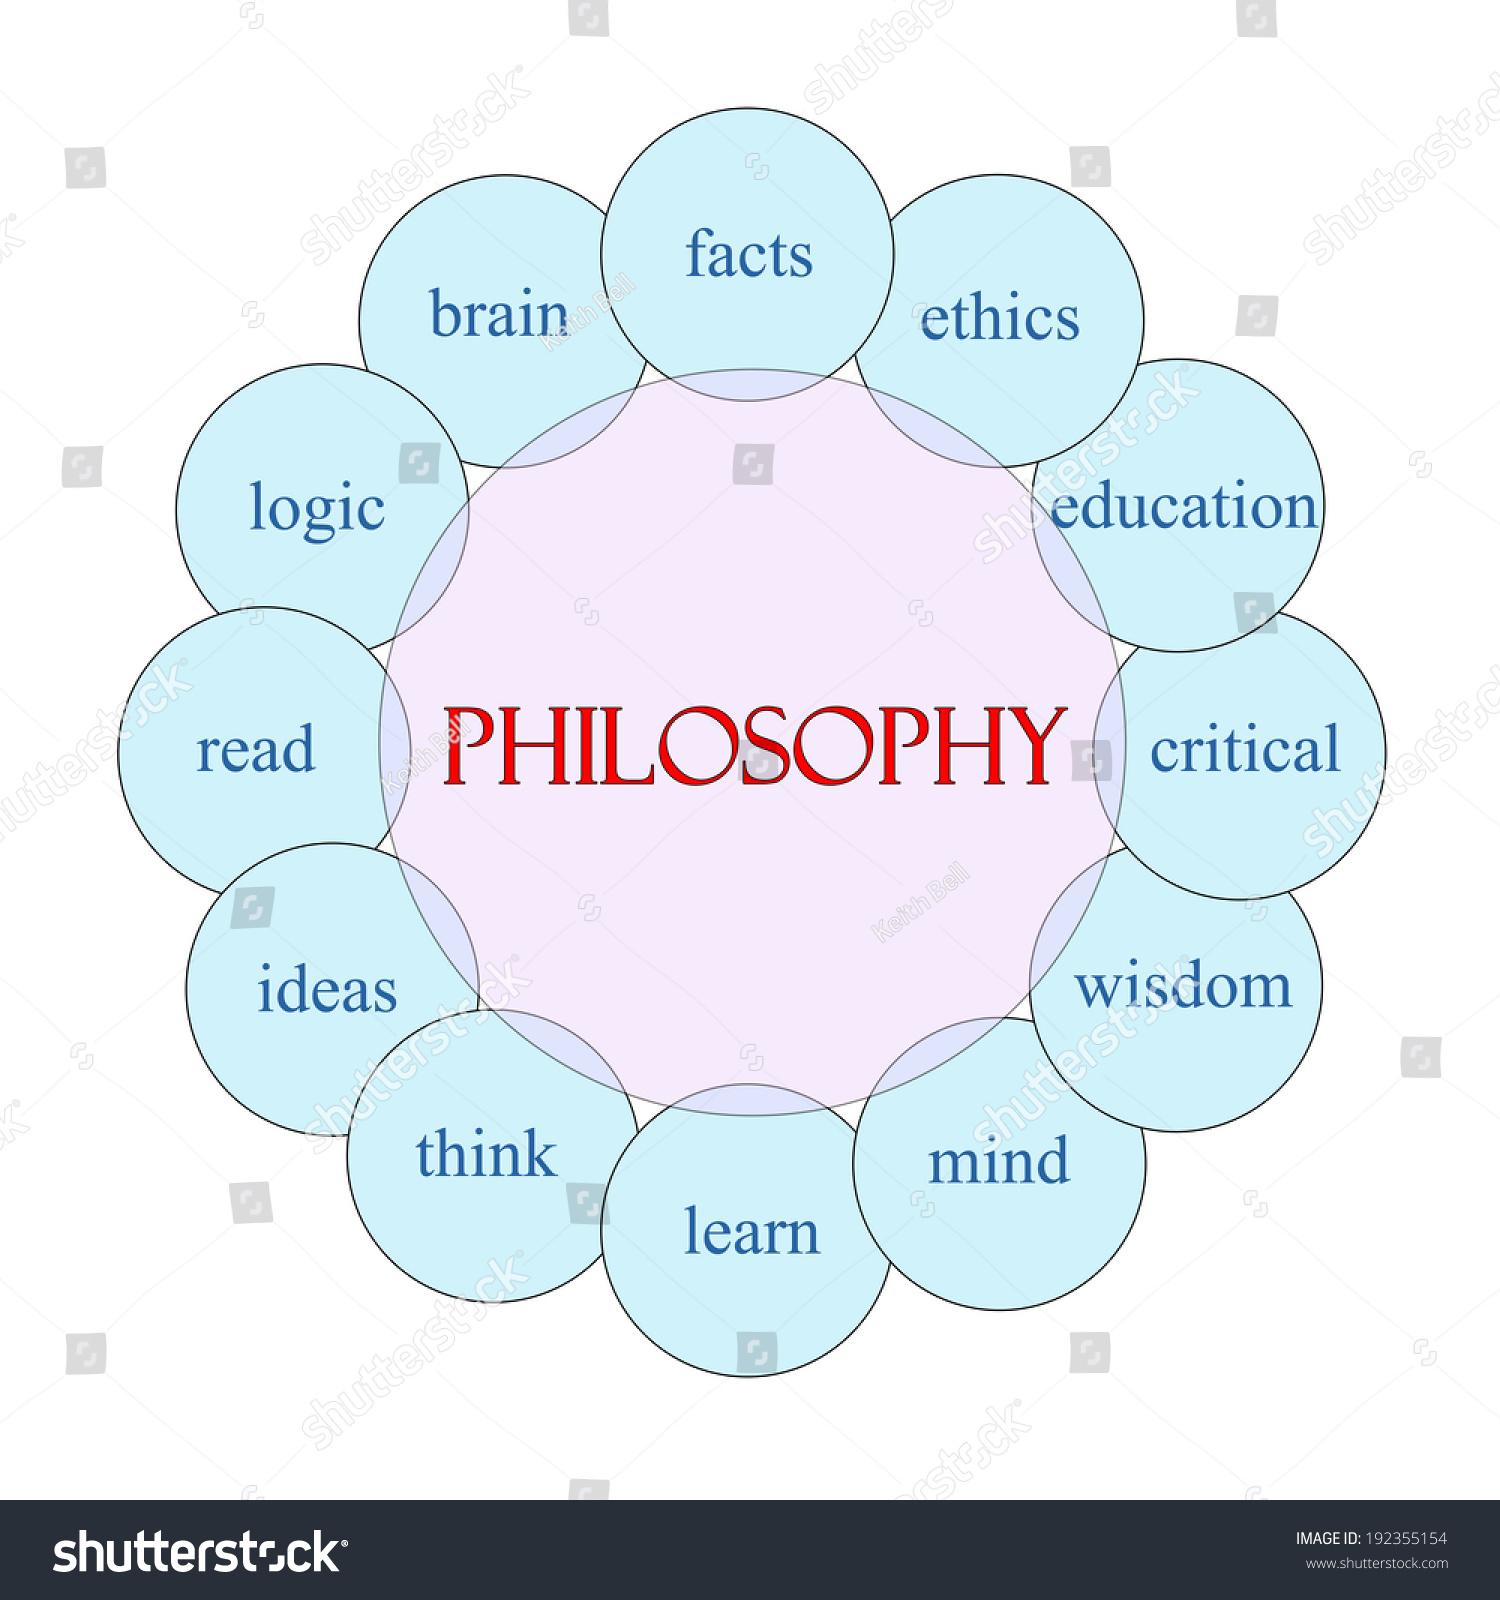 philosophy concept circular diagram pink blue stock illustration Ikigai Diagram